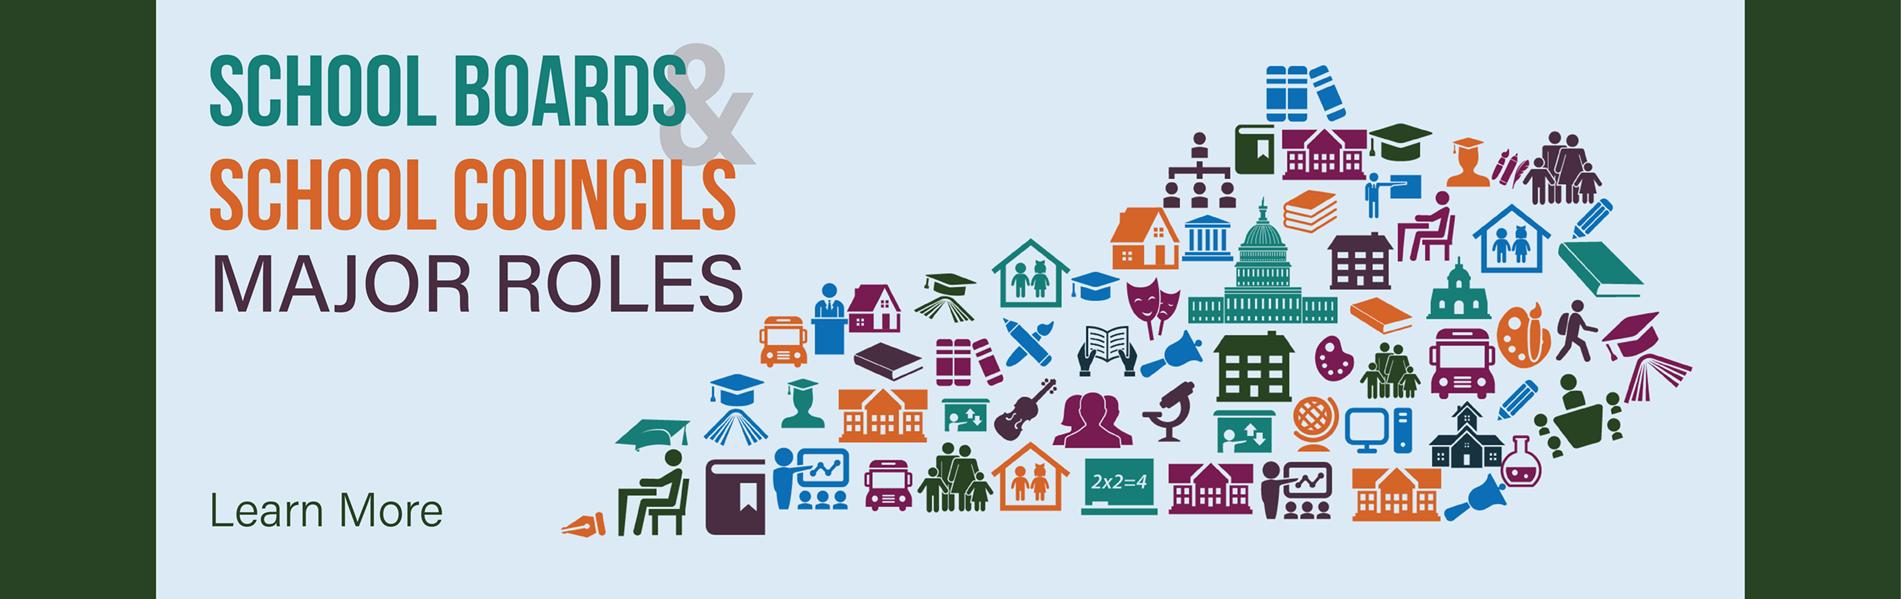 Major Roles of School Boards and School Councils